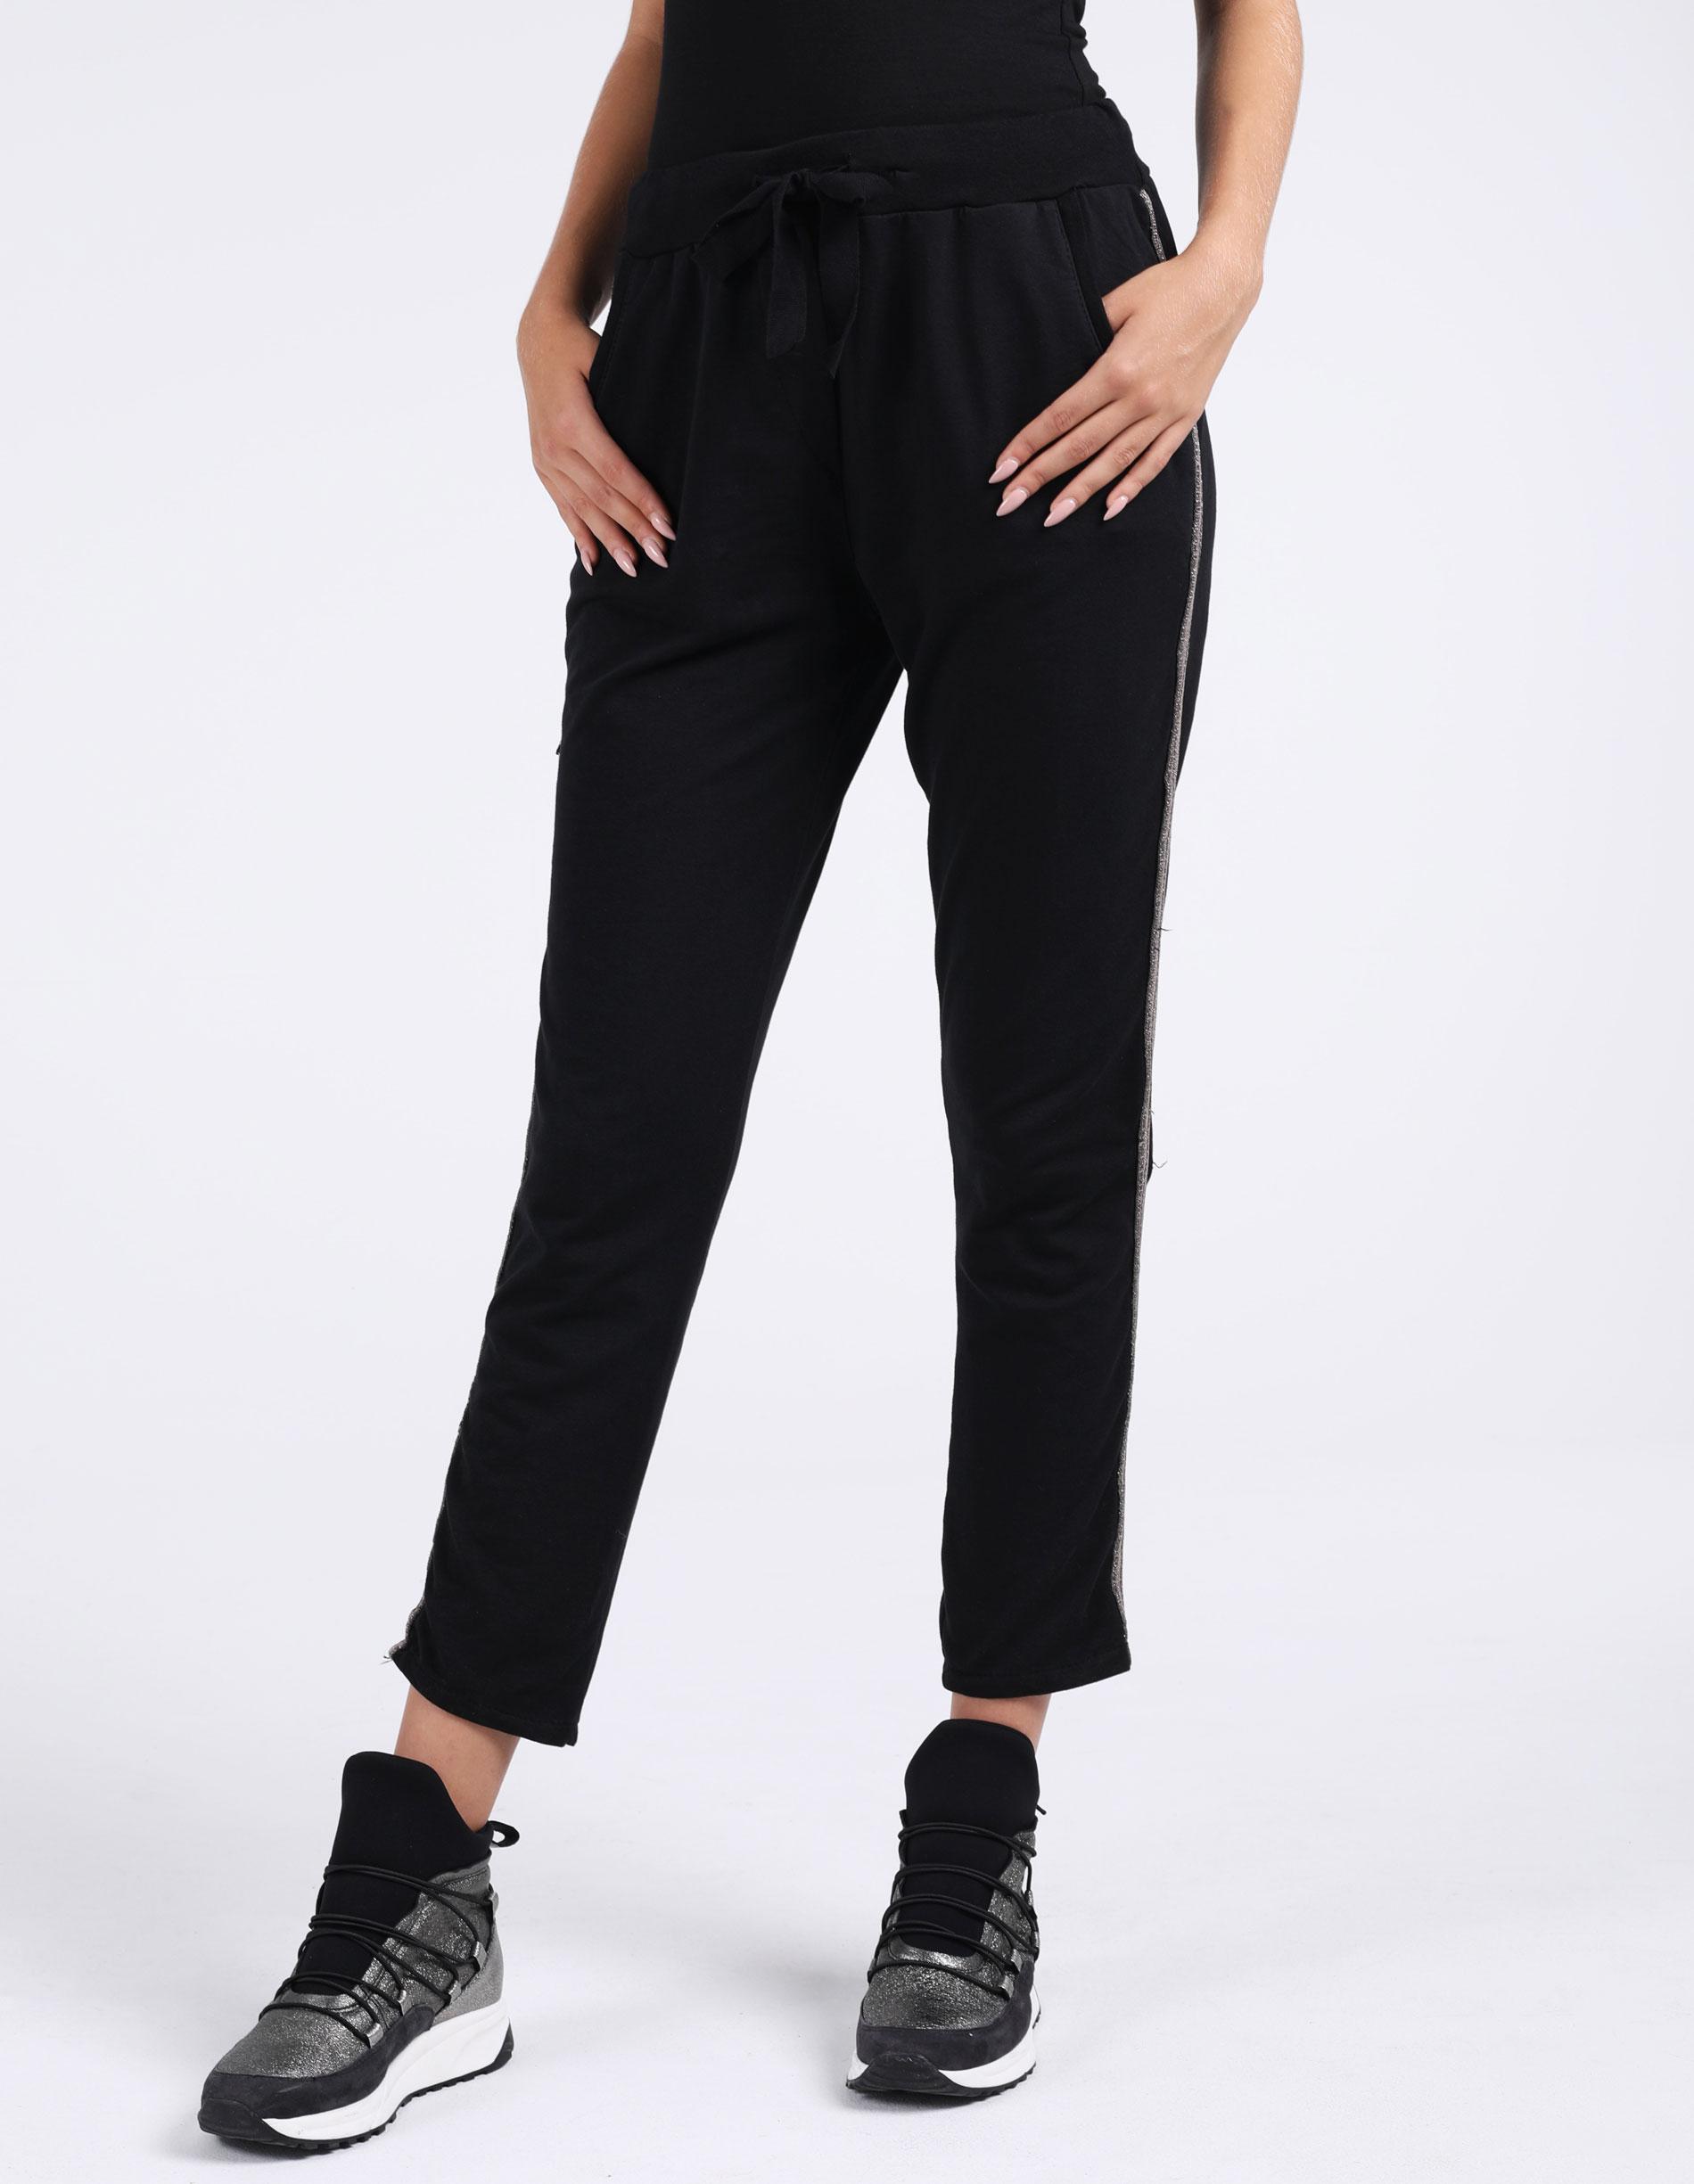 Spodnie - 164-6062 NERO - Unisono